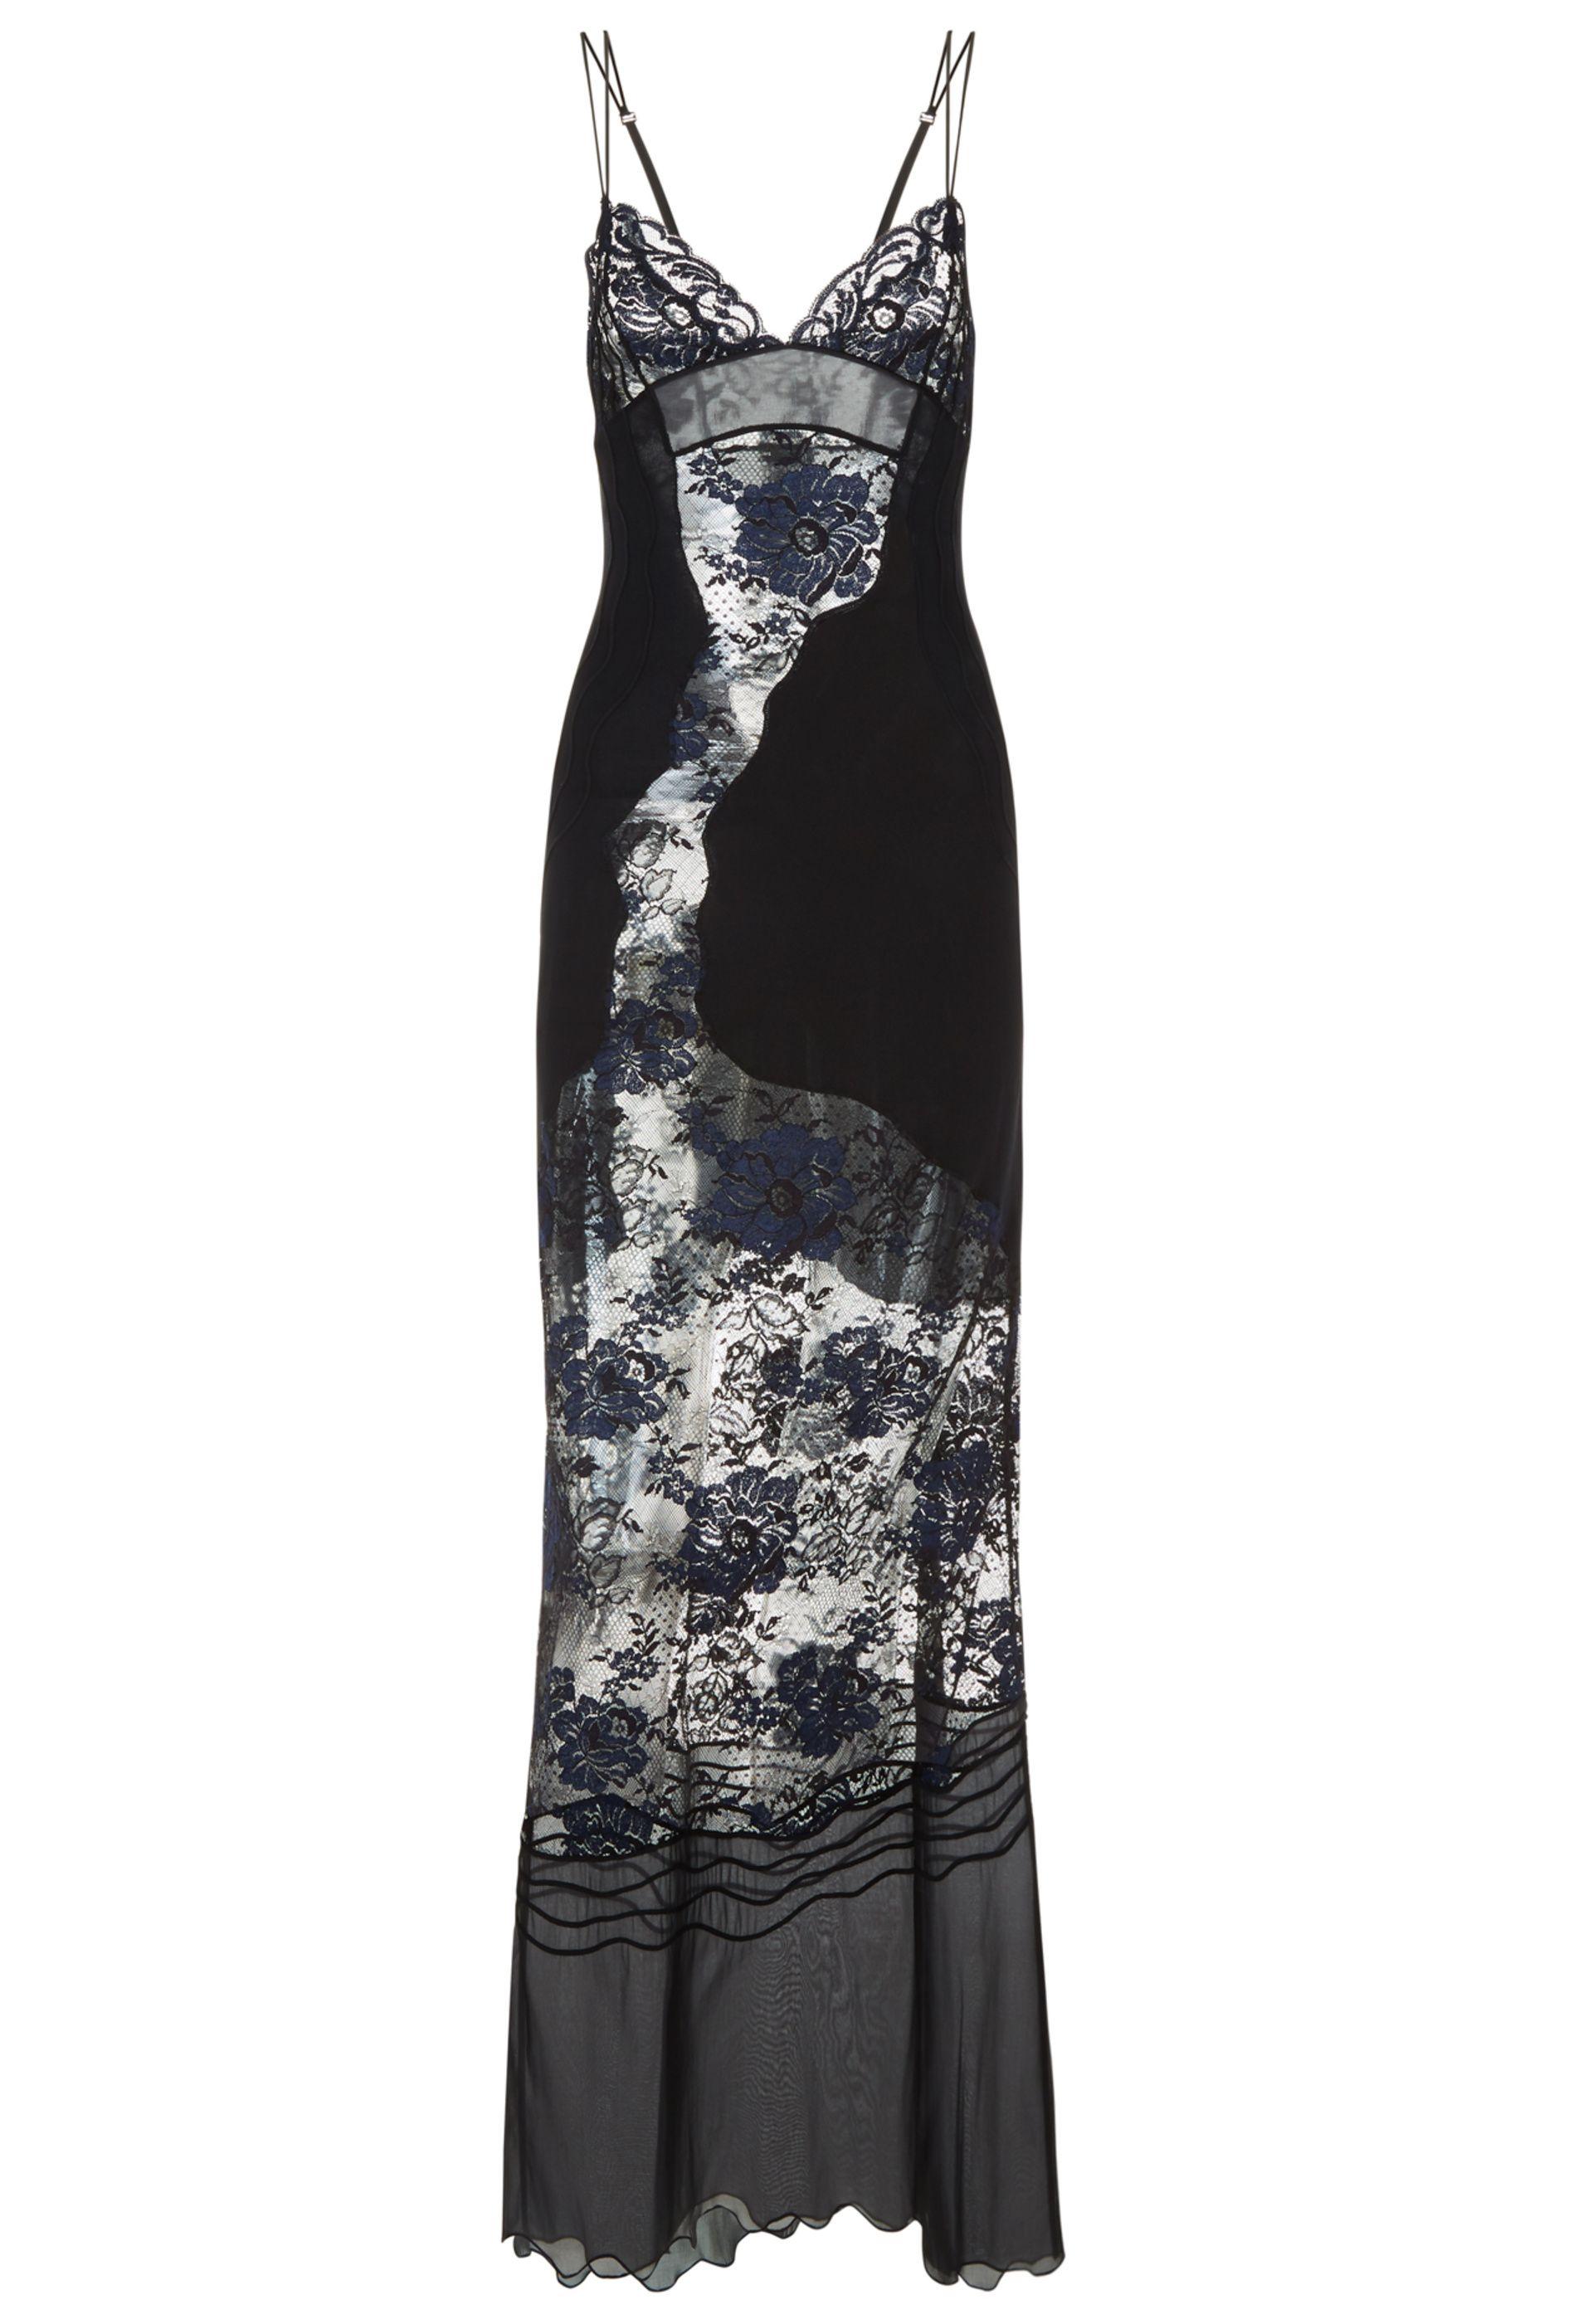 b77f1687c0de LA PERLA   Black silk georgette and Leavers lace nightgown with soutache  embroidery #laperlalingerie #lingerie